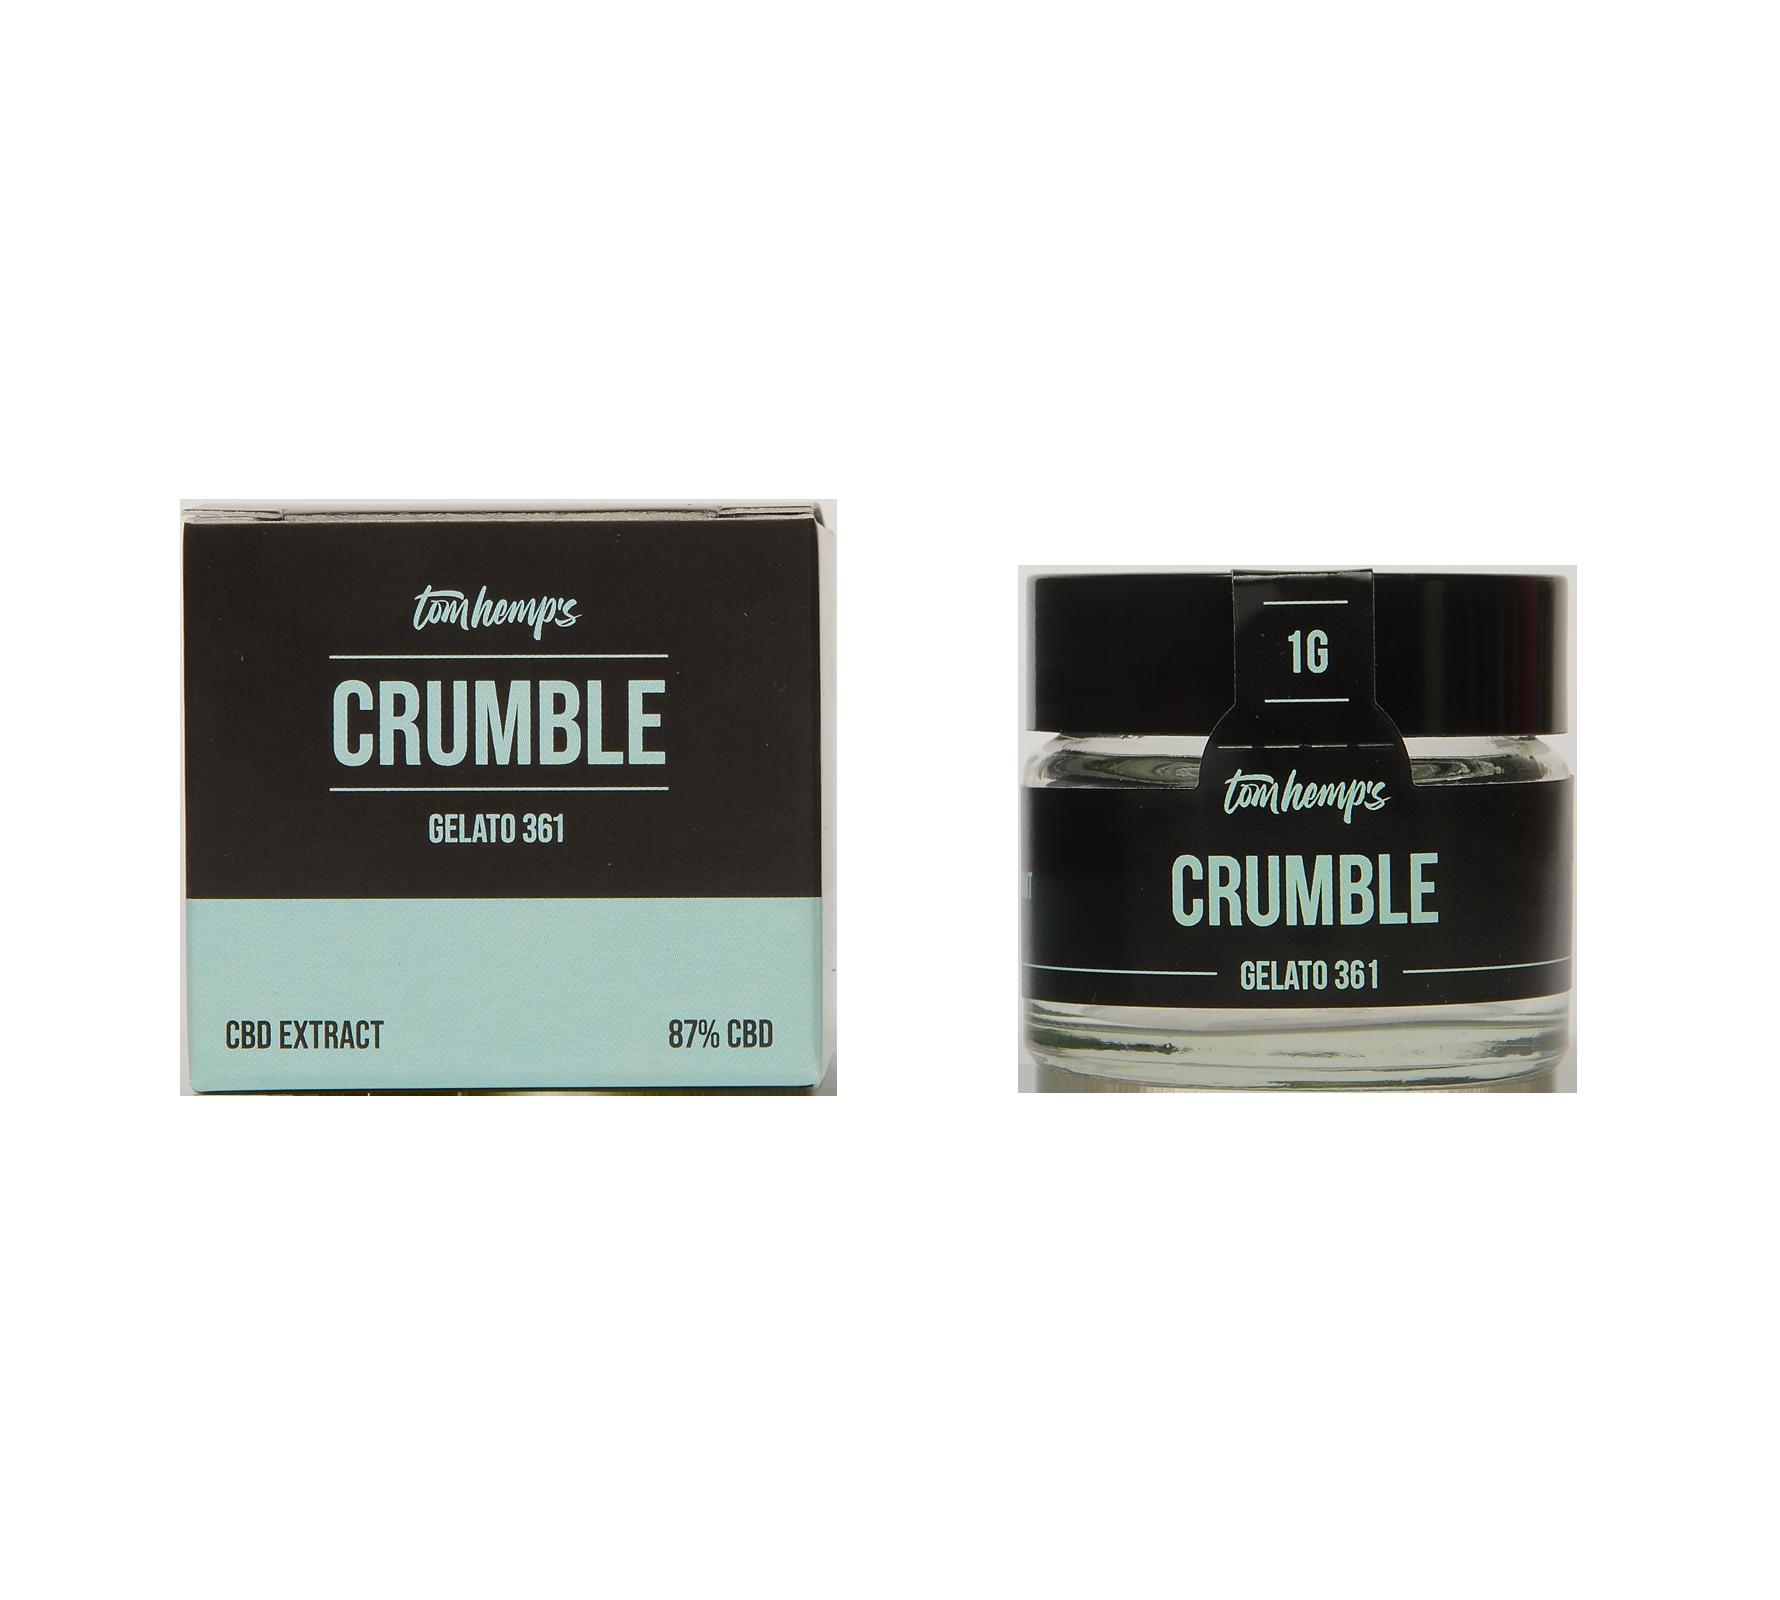 CBD Crumble 87% Gelato 361